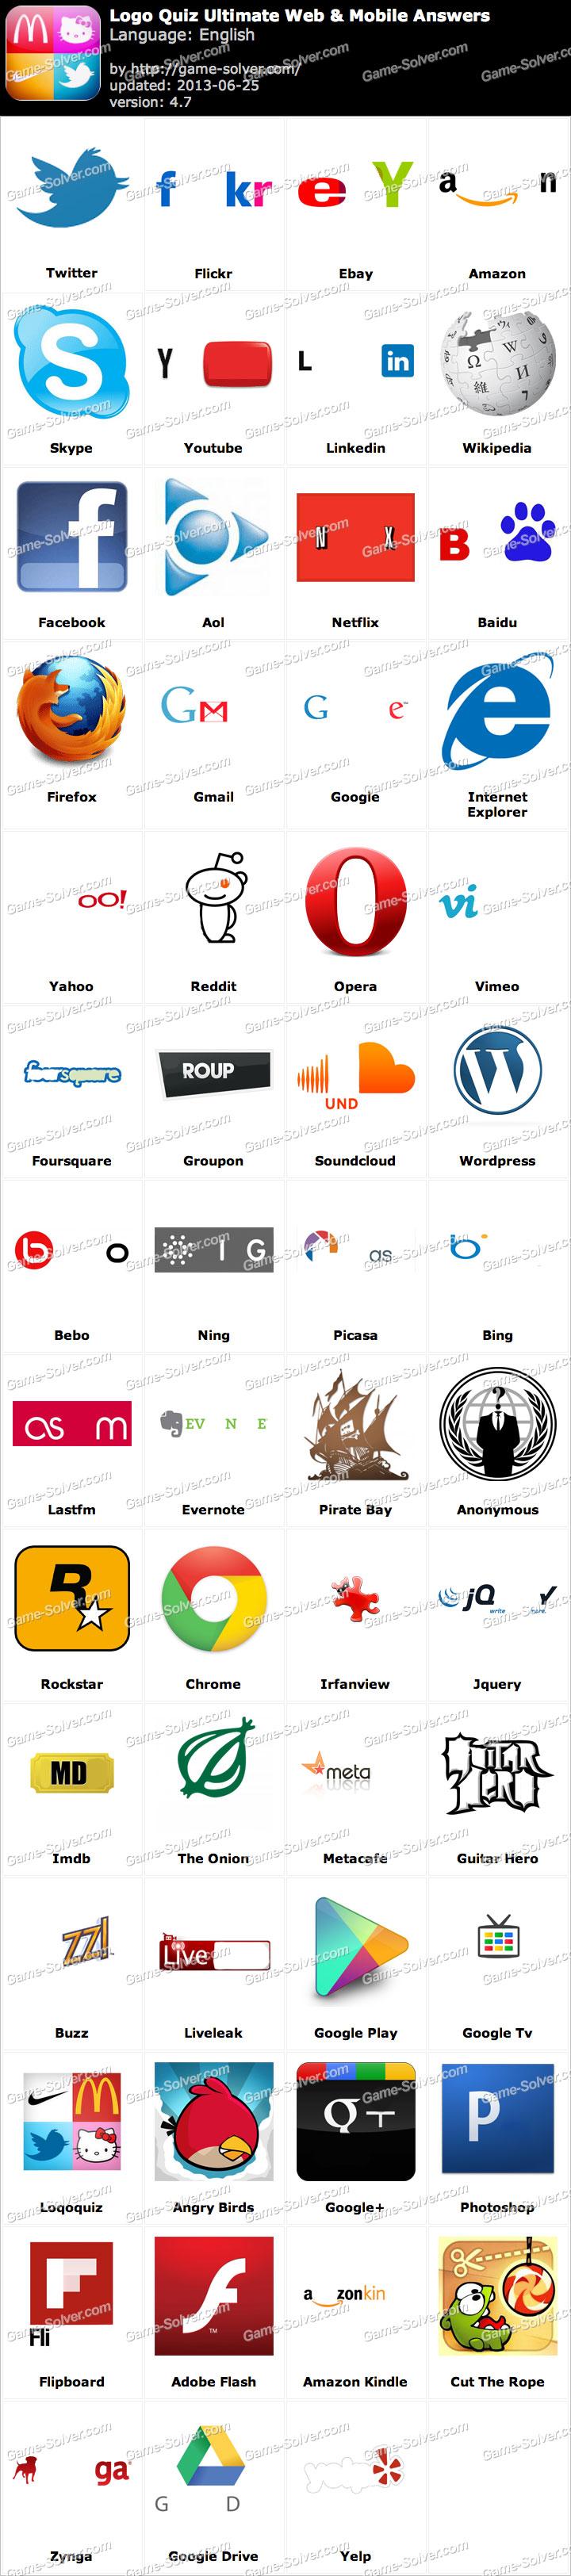 Logo Quiz Ultimate Web Answers